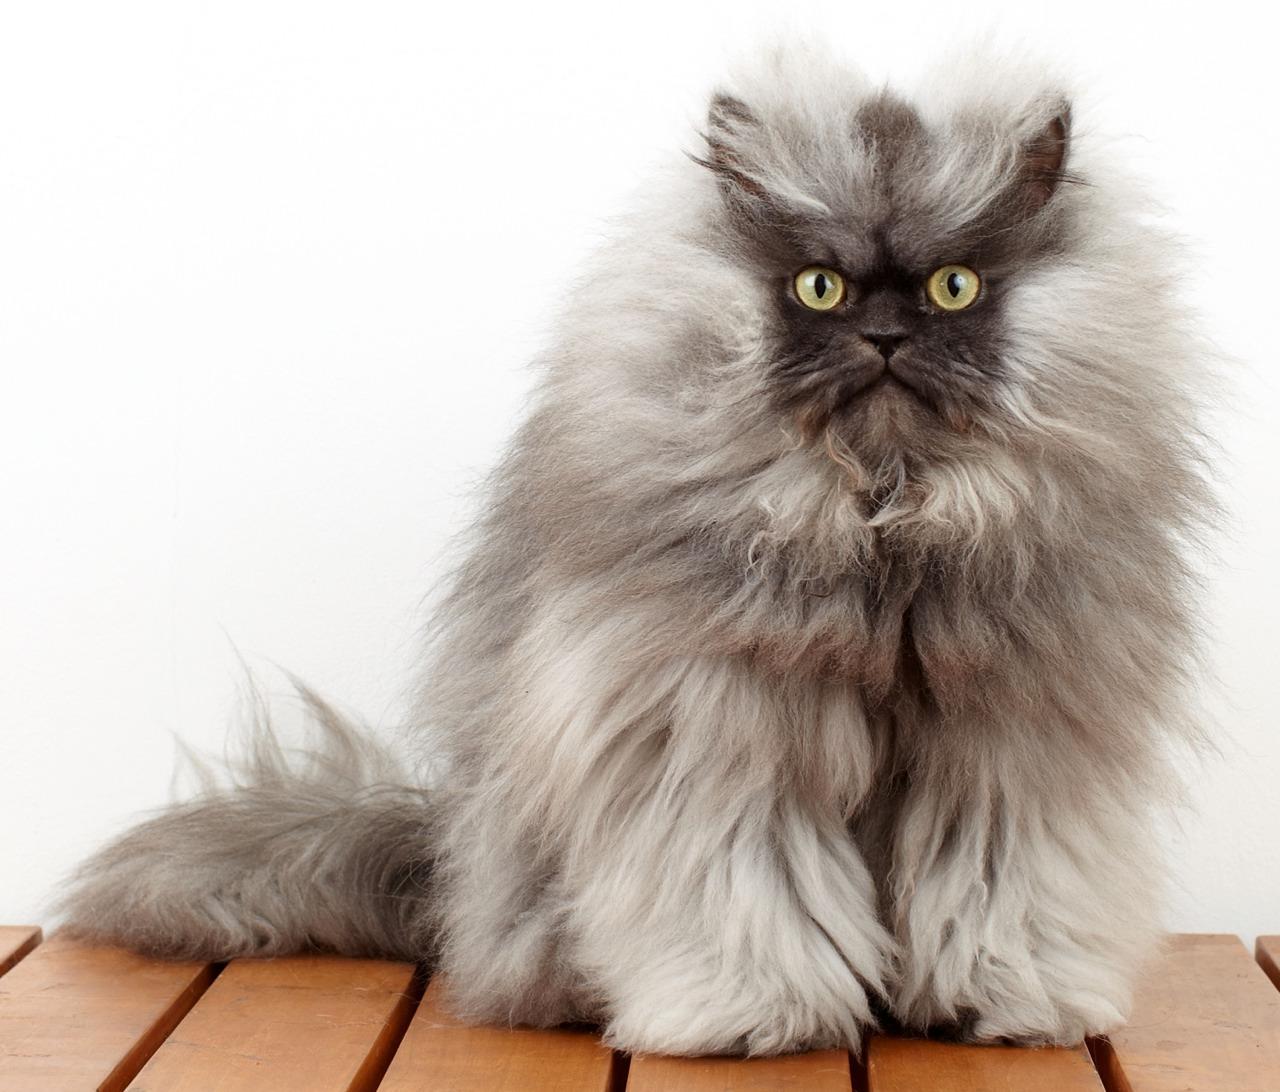 grumpycat4